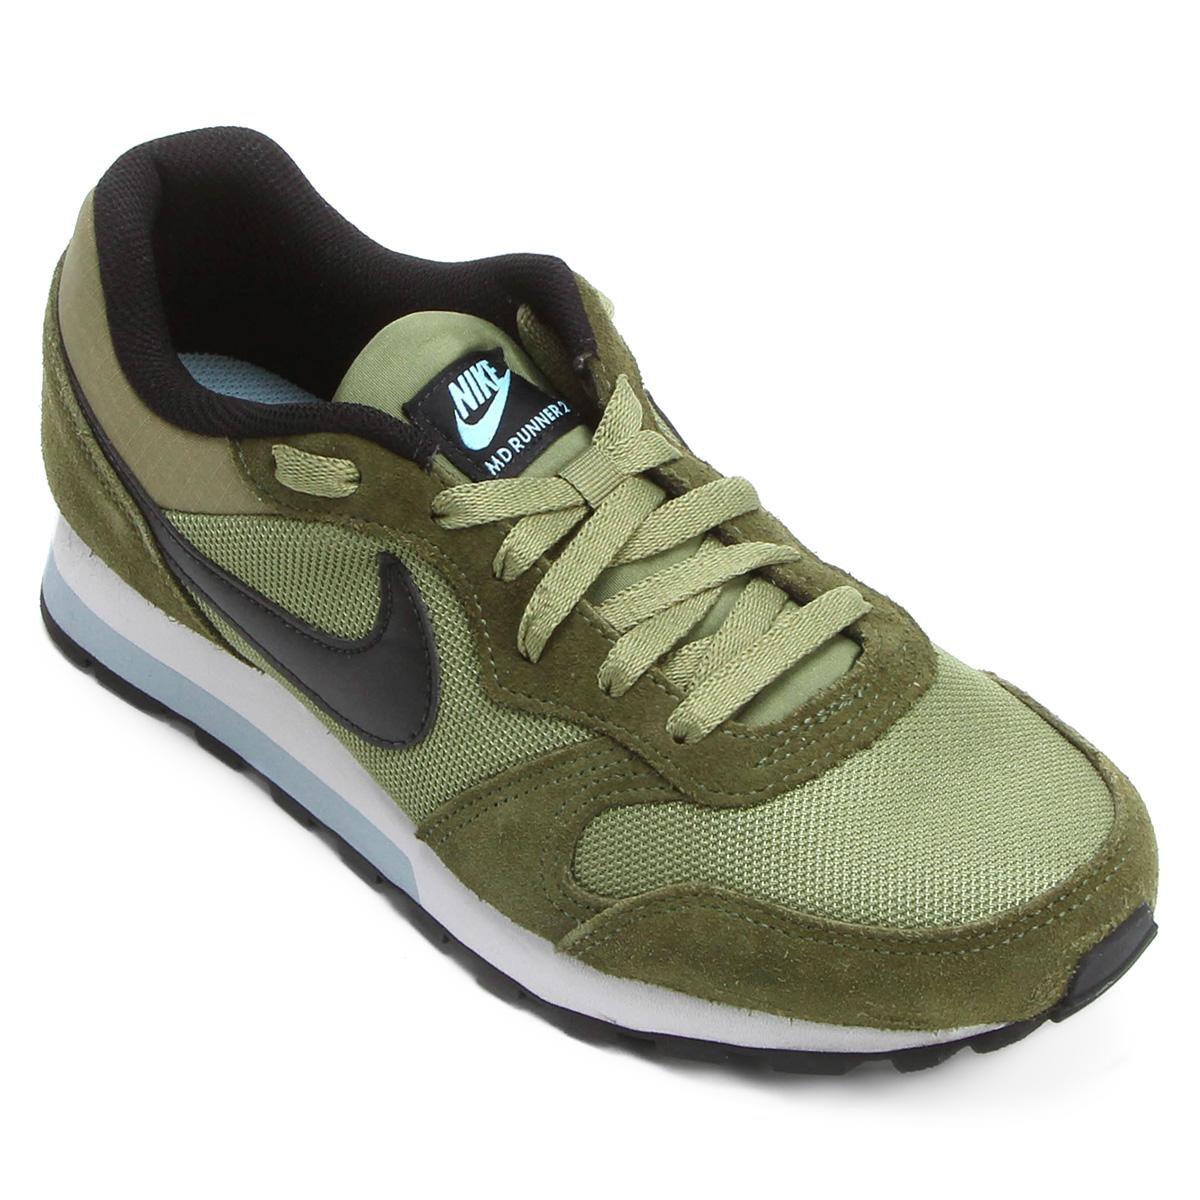 f4205117b3 Tênis Nike Md Runner 2 Masculino - Verde e Preto - Compre Agora ...